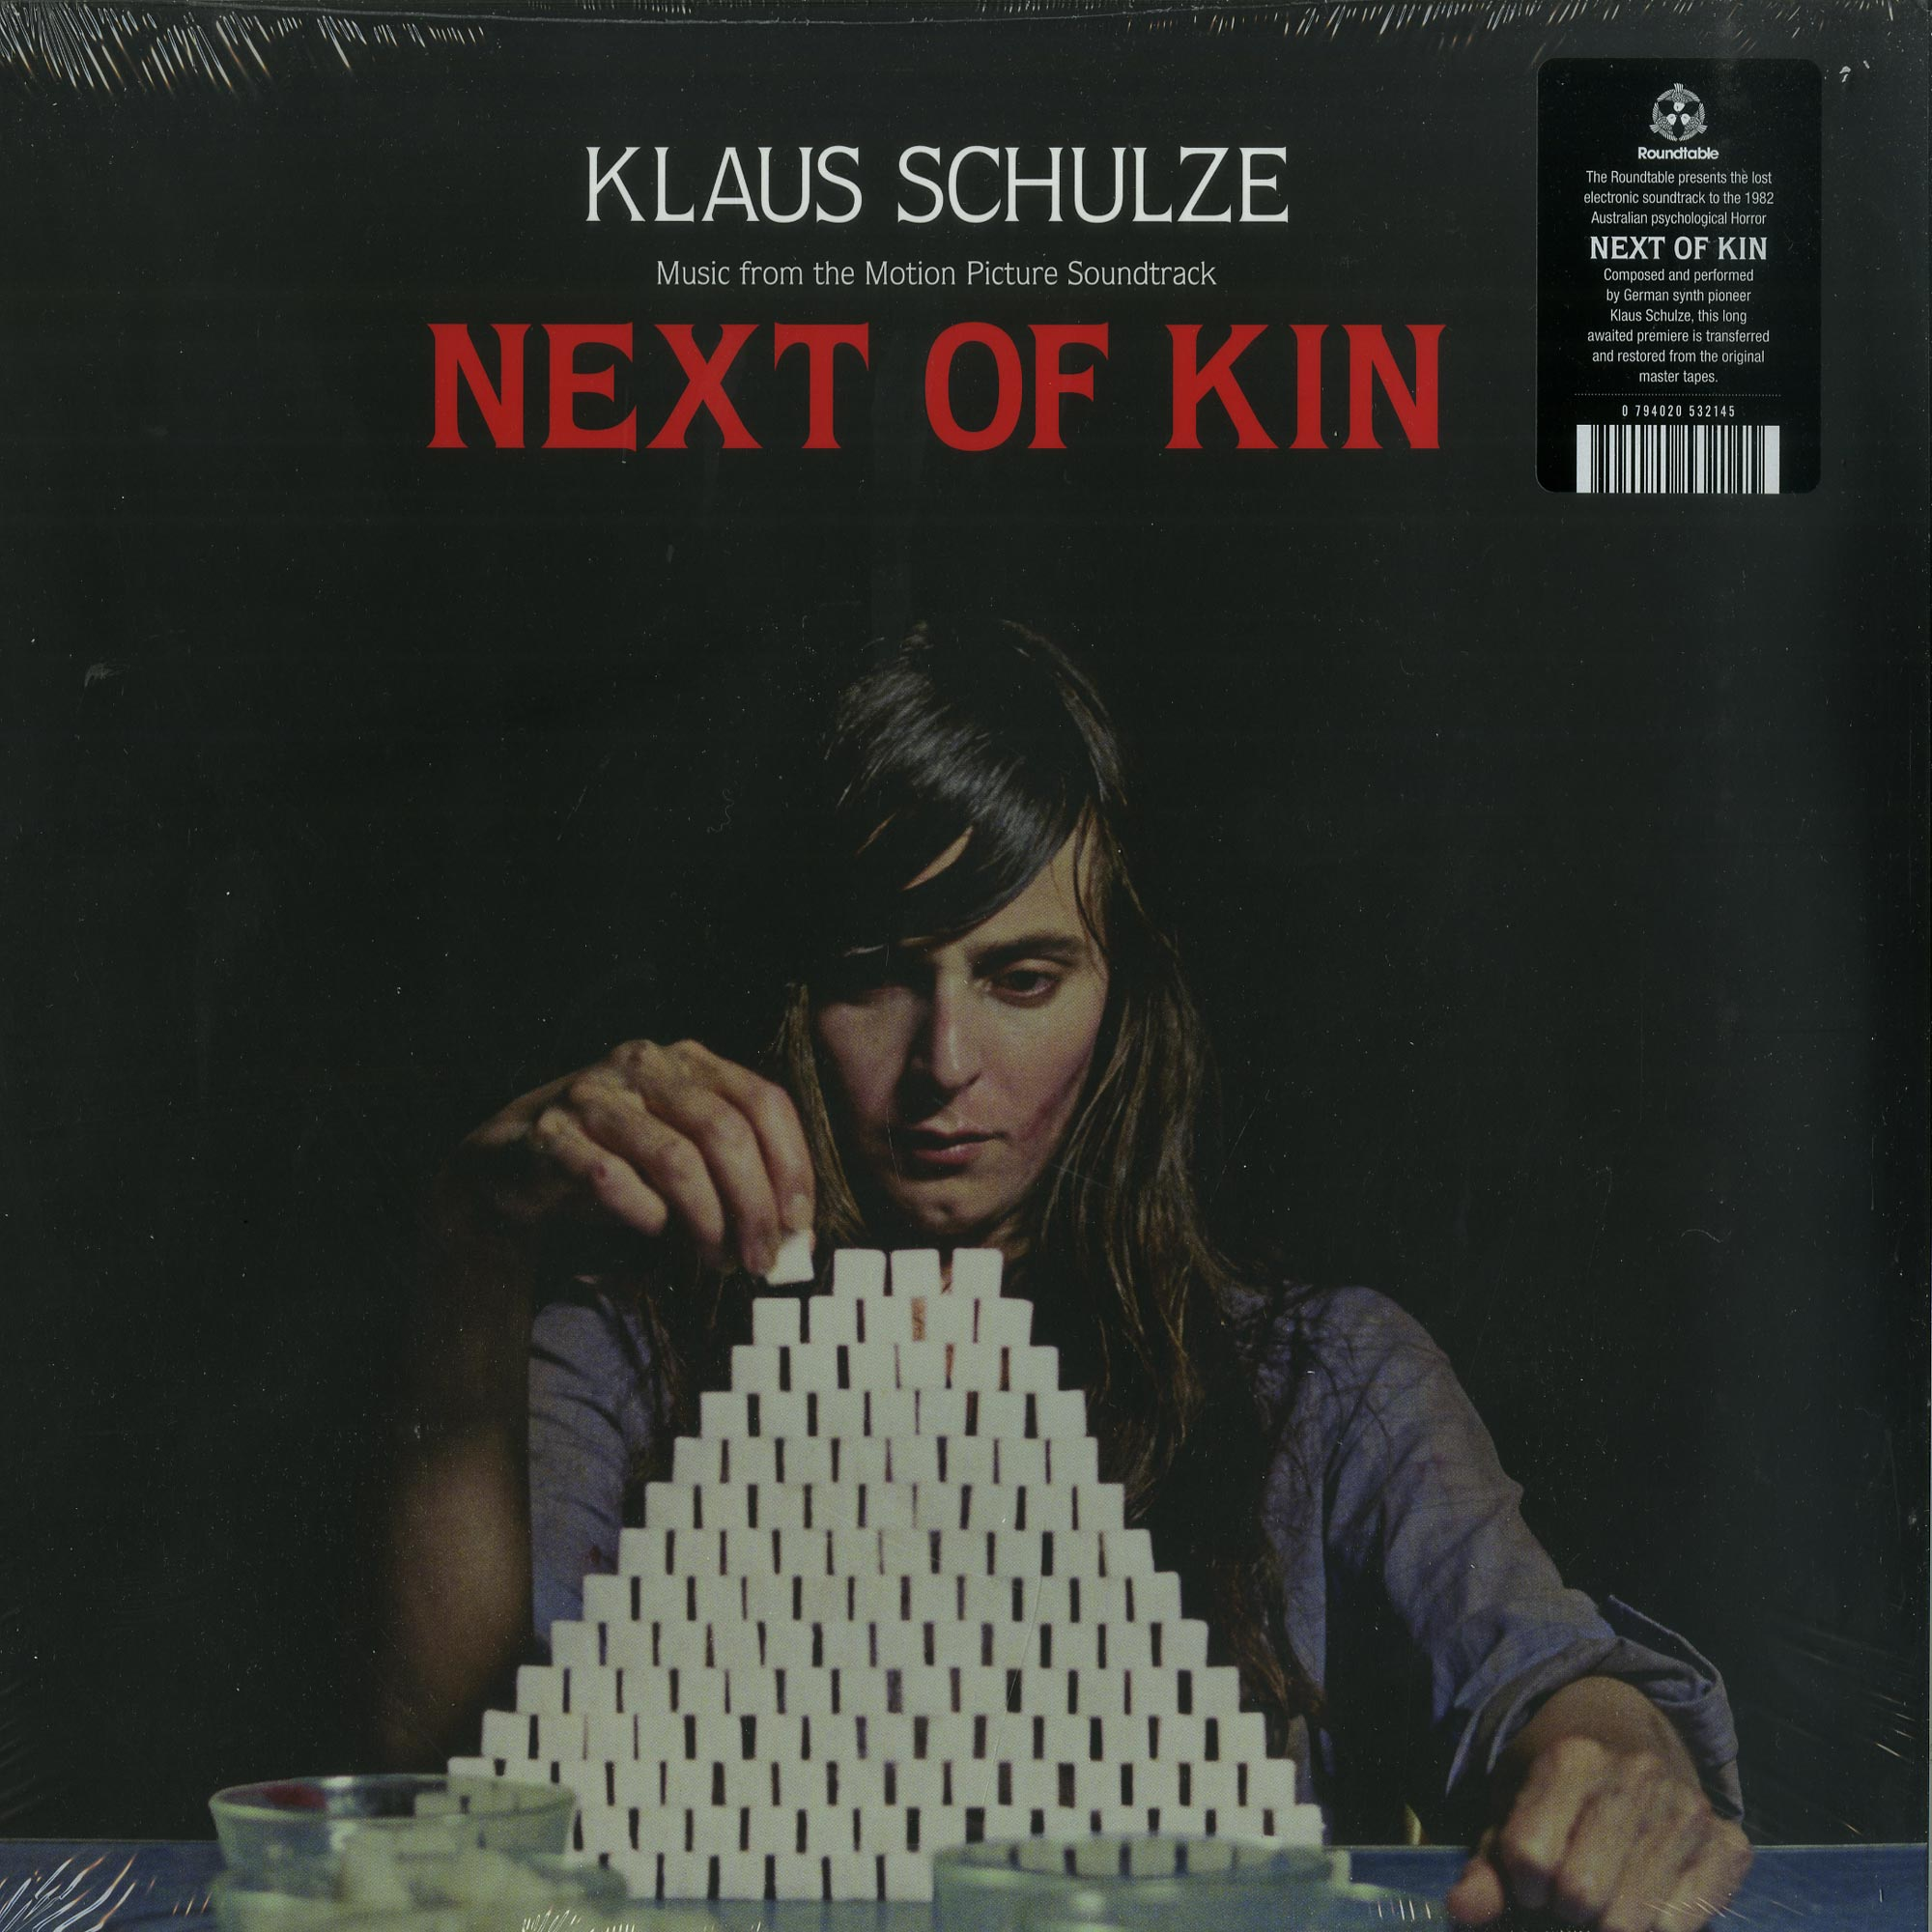 Klaus Schulze - NEXT OF KIN O.S.T.